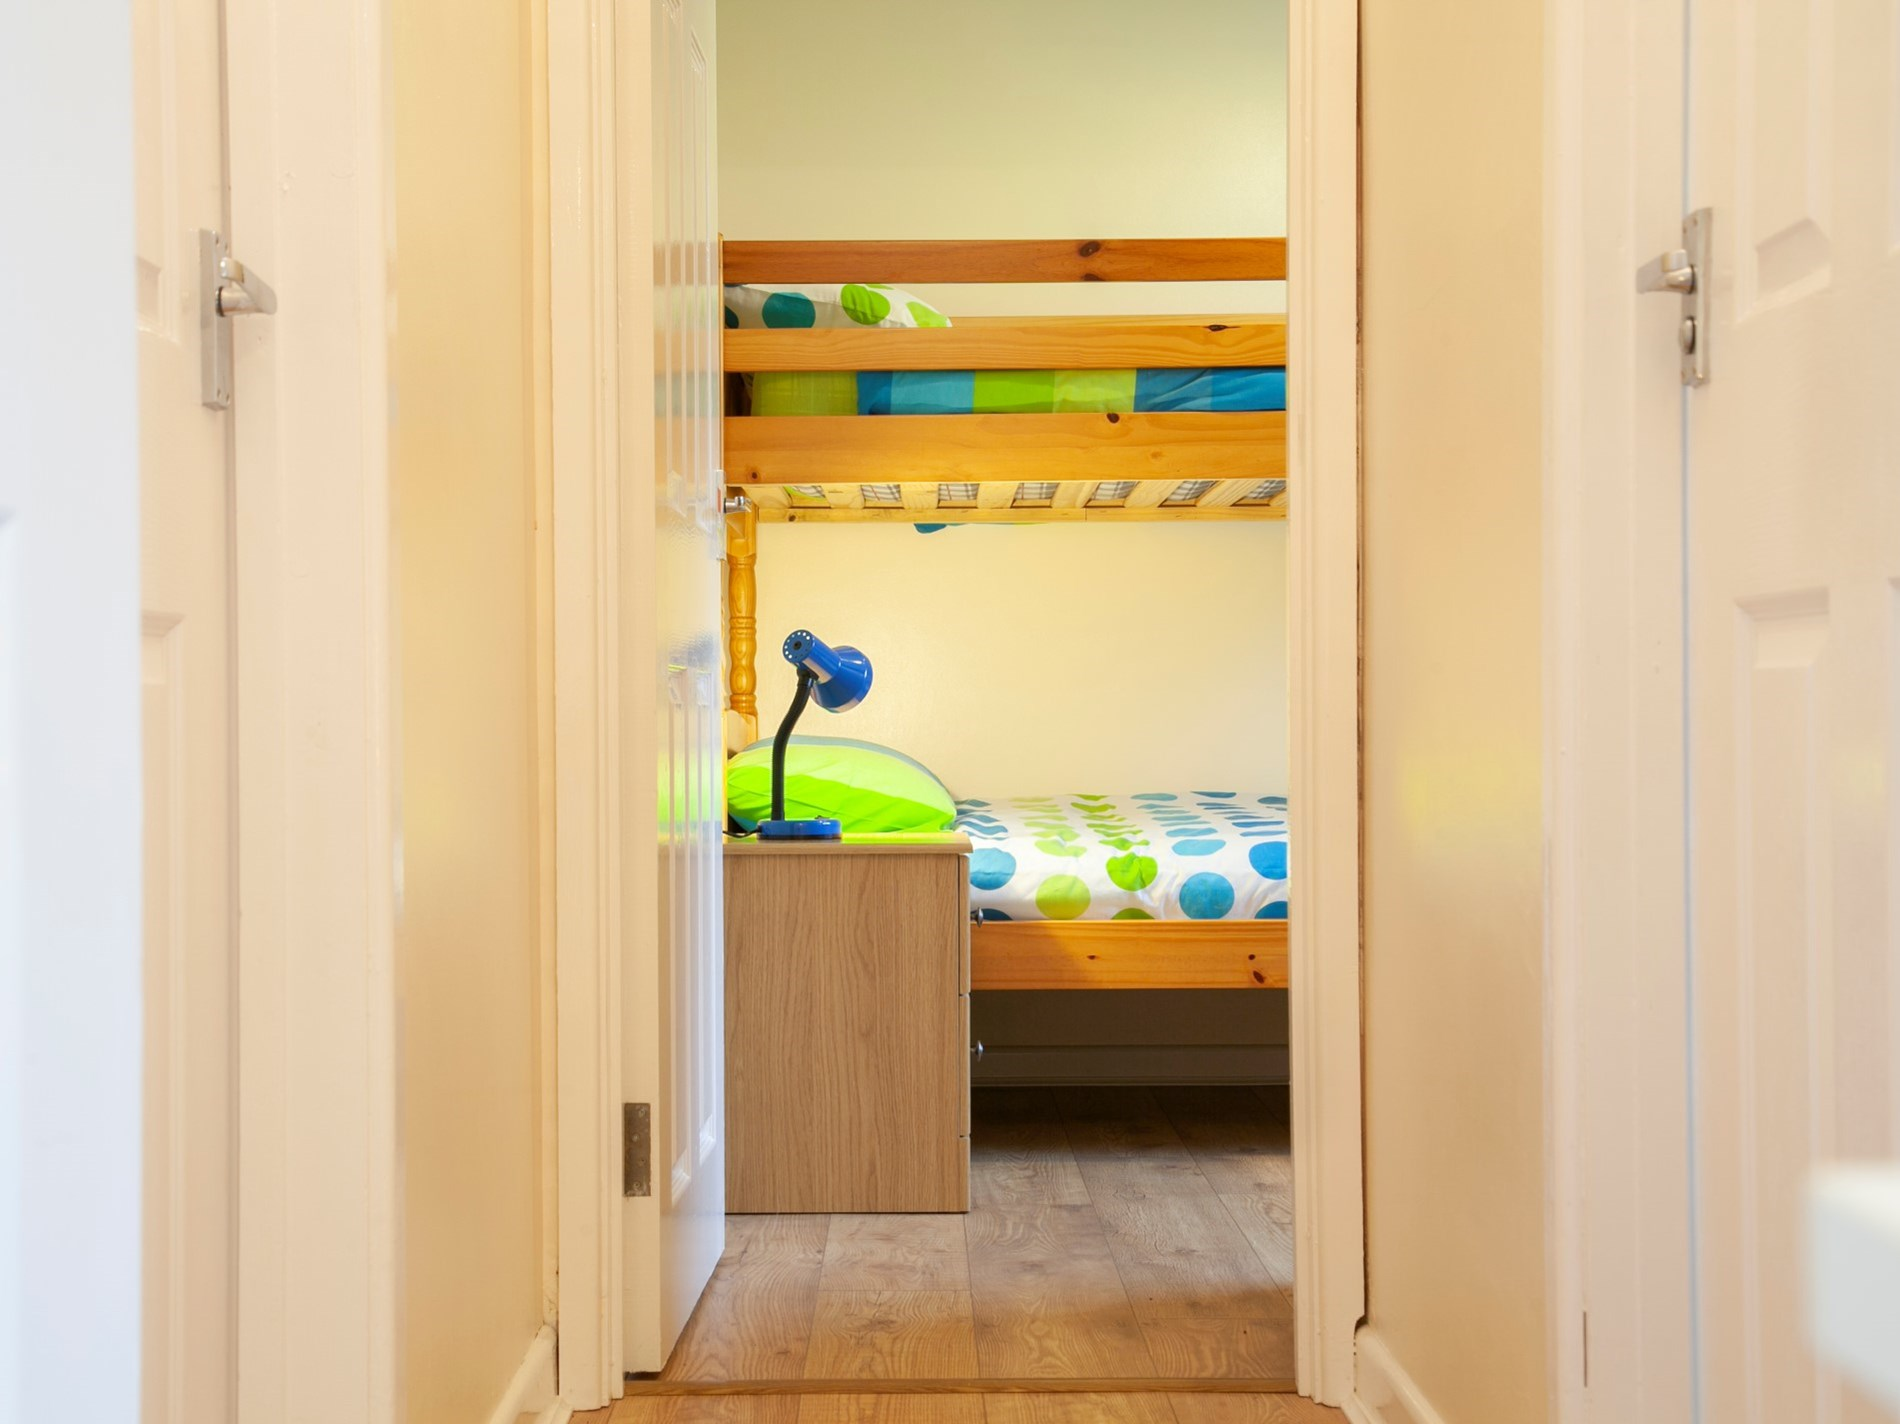 View down the hallway towards the bunk bedroom